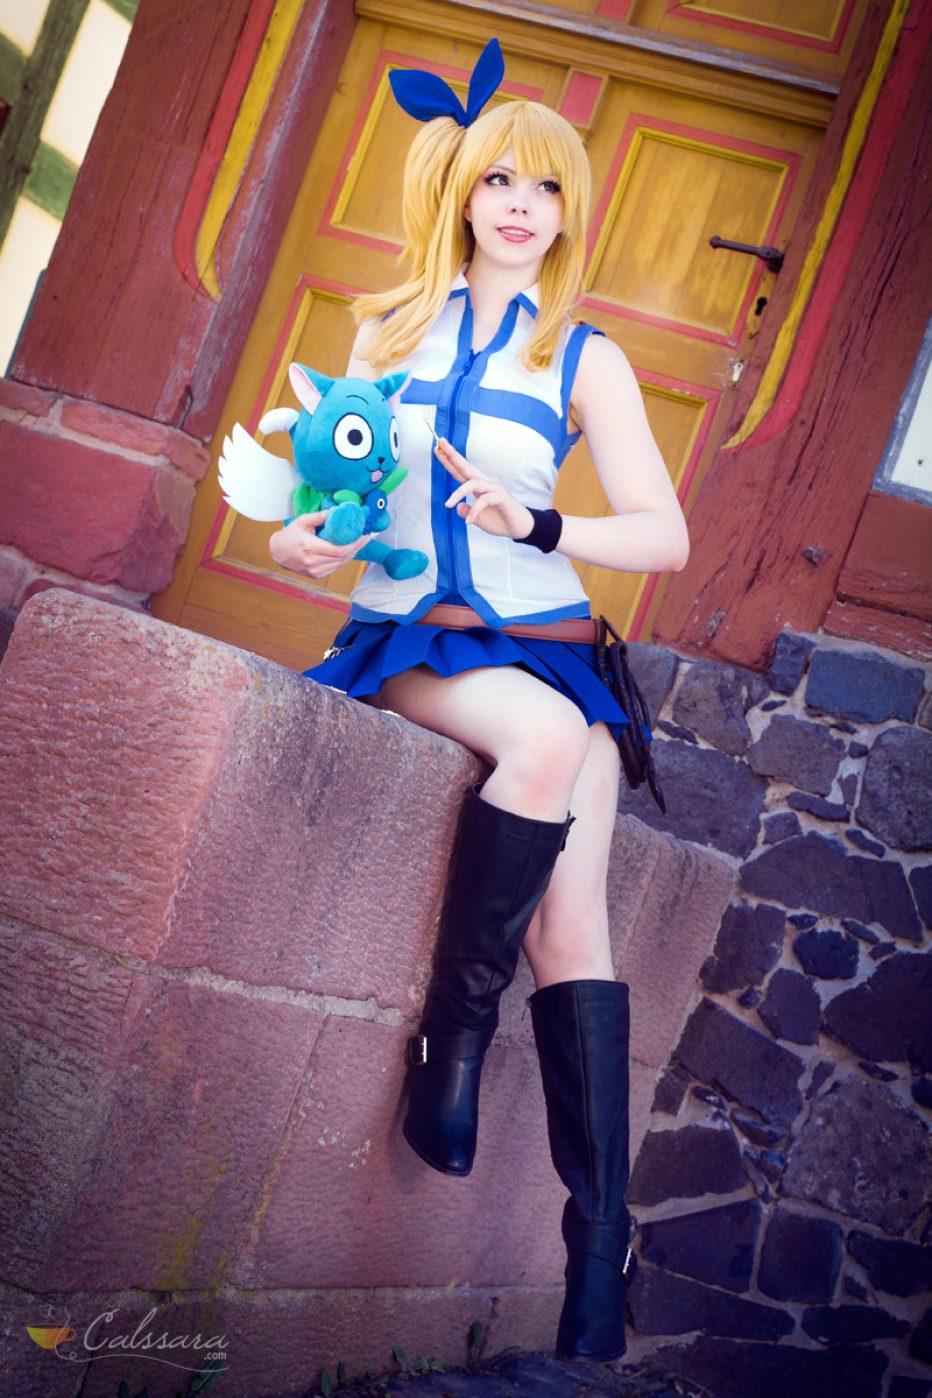 Fairy-Tail-Lucy-Heartfilia-Cosplay-Gamers-Heroes-4.jpg